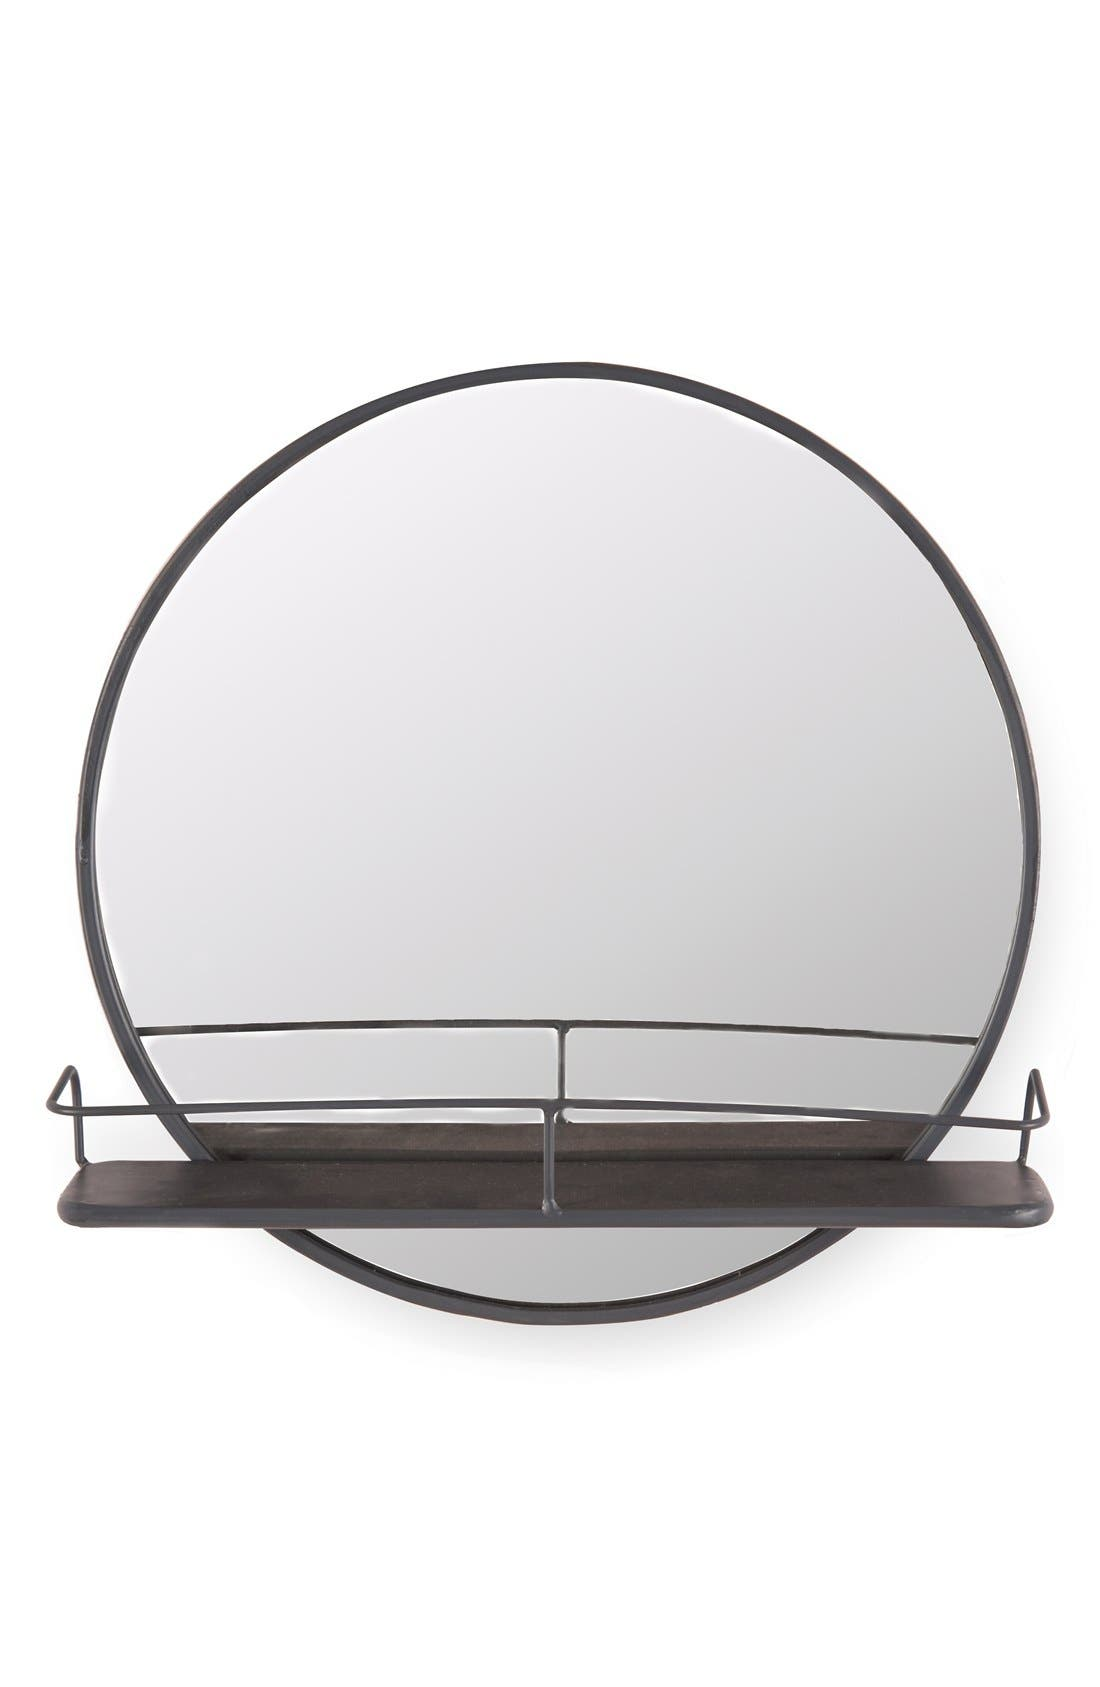 Alternate Image 1 Selected - Foreside Circle Shelf Mirror